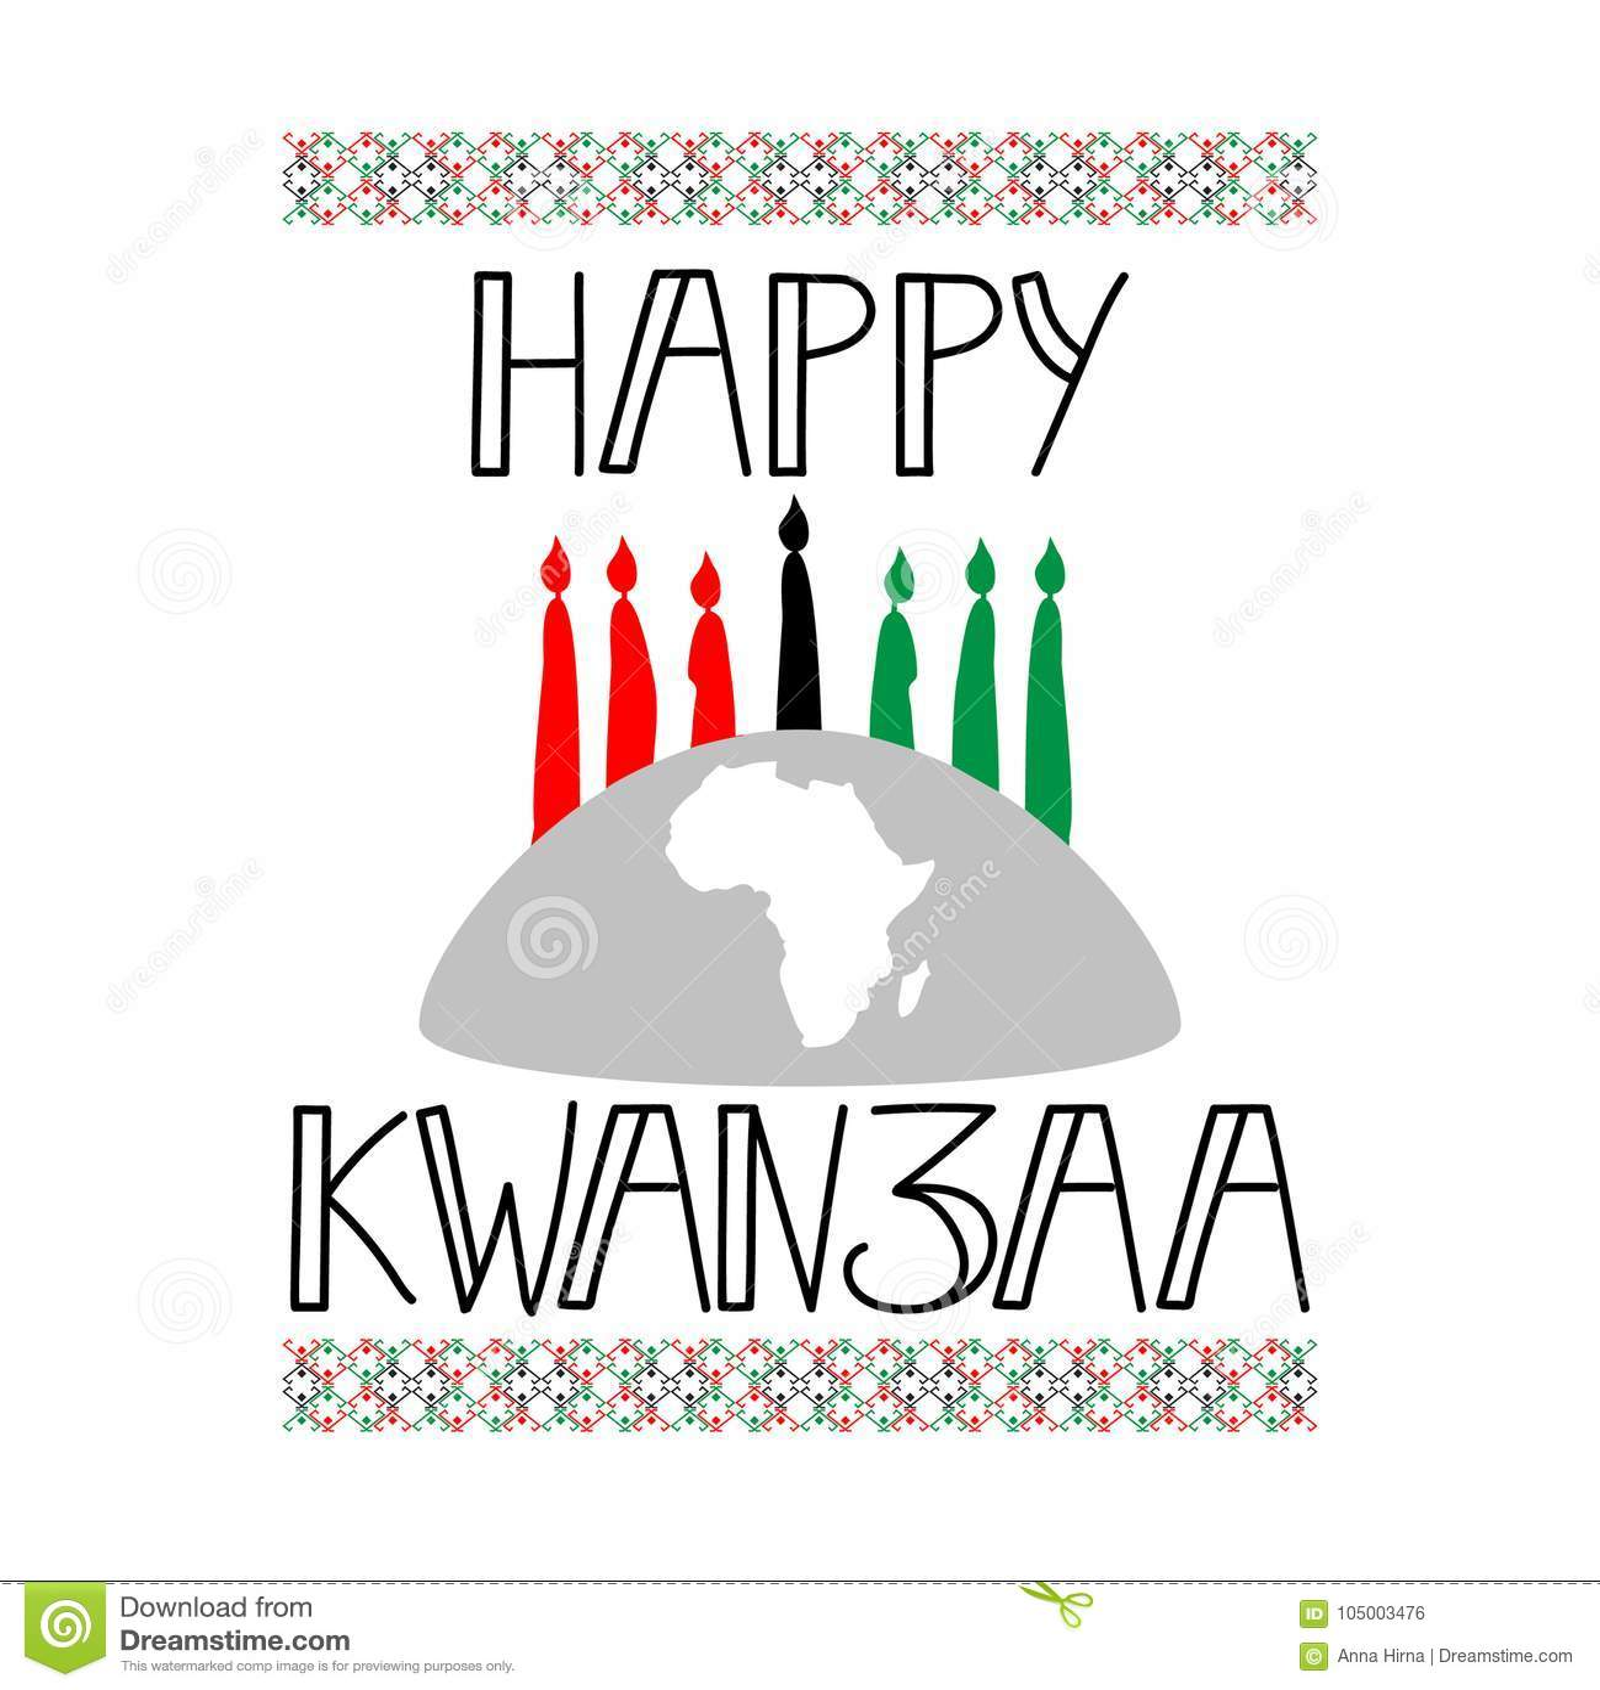 Happy kwanzaa decorative greeting card stock illustration happy kwanzaa decorative greeting card africanamerican 26th kristyandbryce Gallery